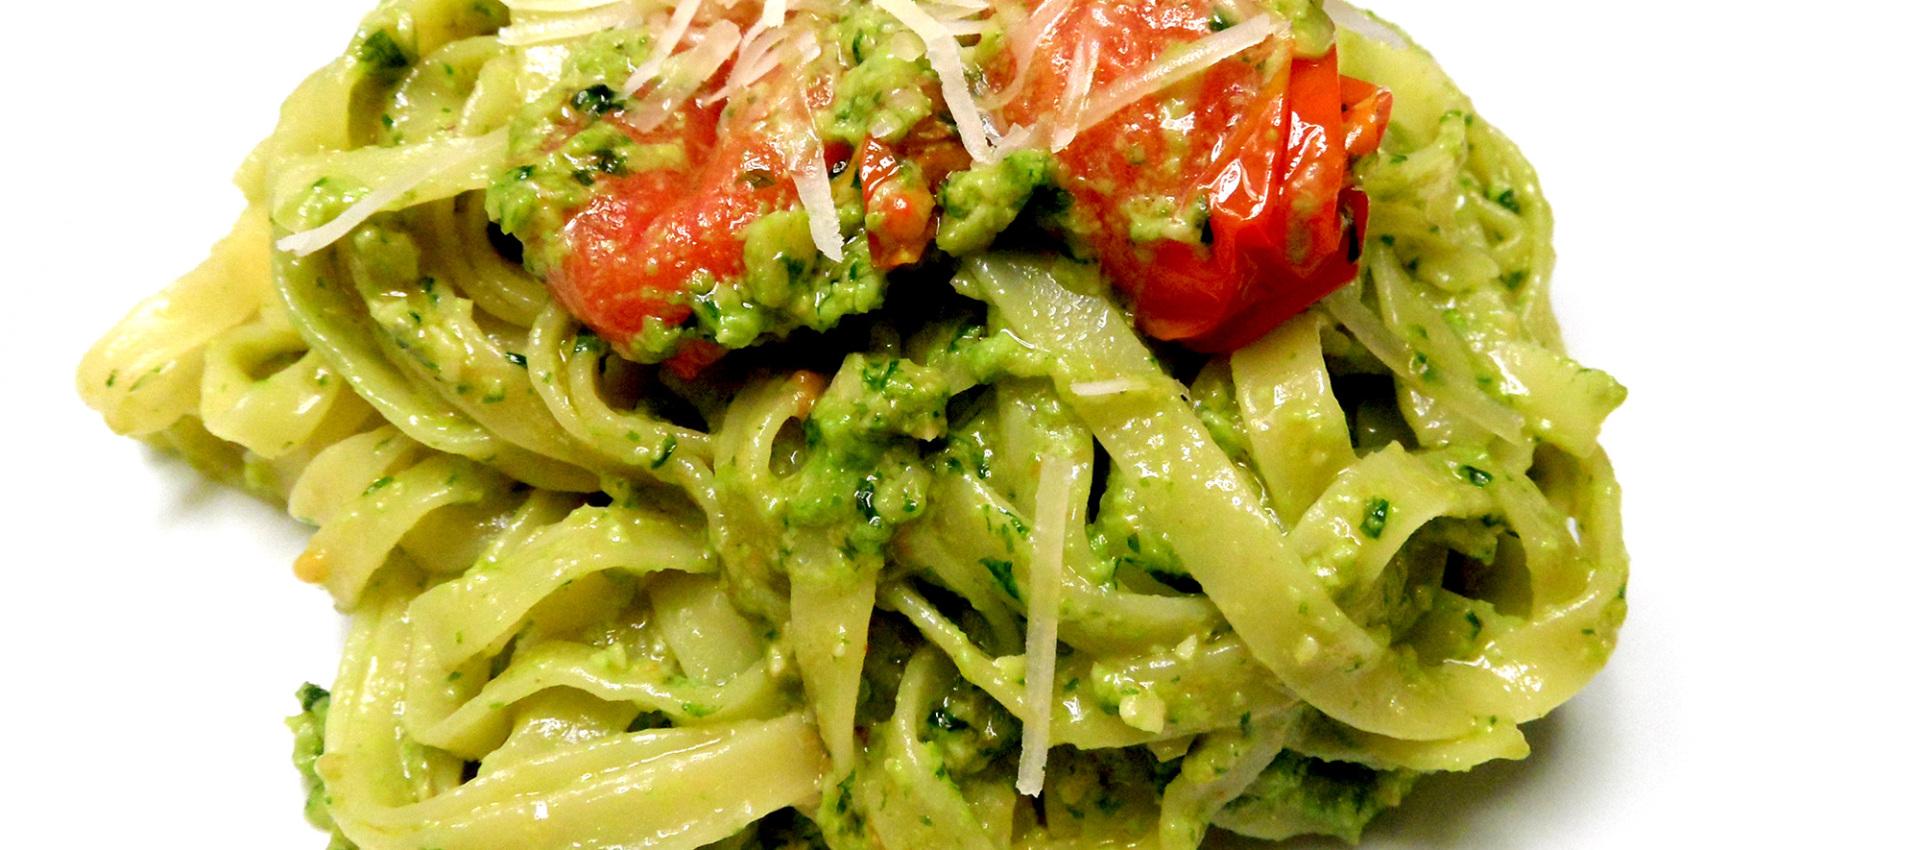 Rezept grünes Pesto mit Rucola & Basilikum - kochbock.de